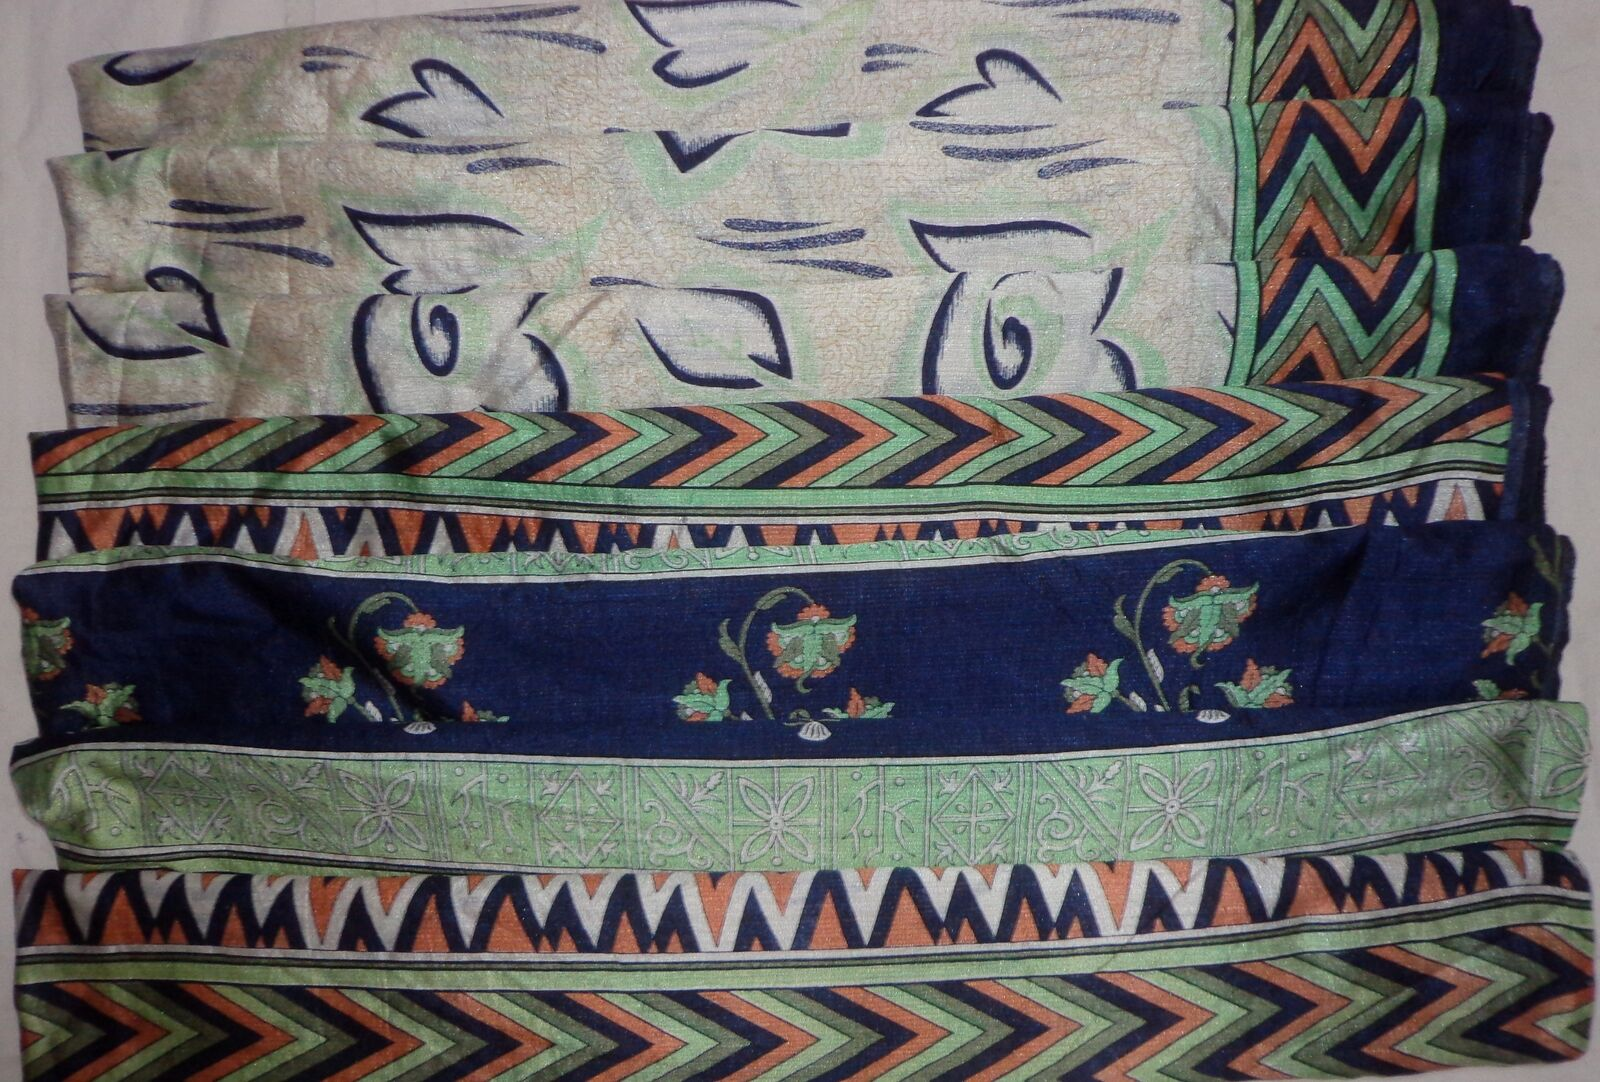 WEARABLE SILK BLEND ANTIQUE VINTAGE SARI SAREE 5 YD A3 369 Cream Navyblue #ABHS1